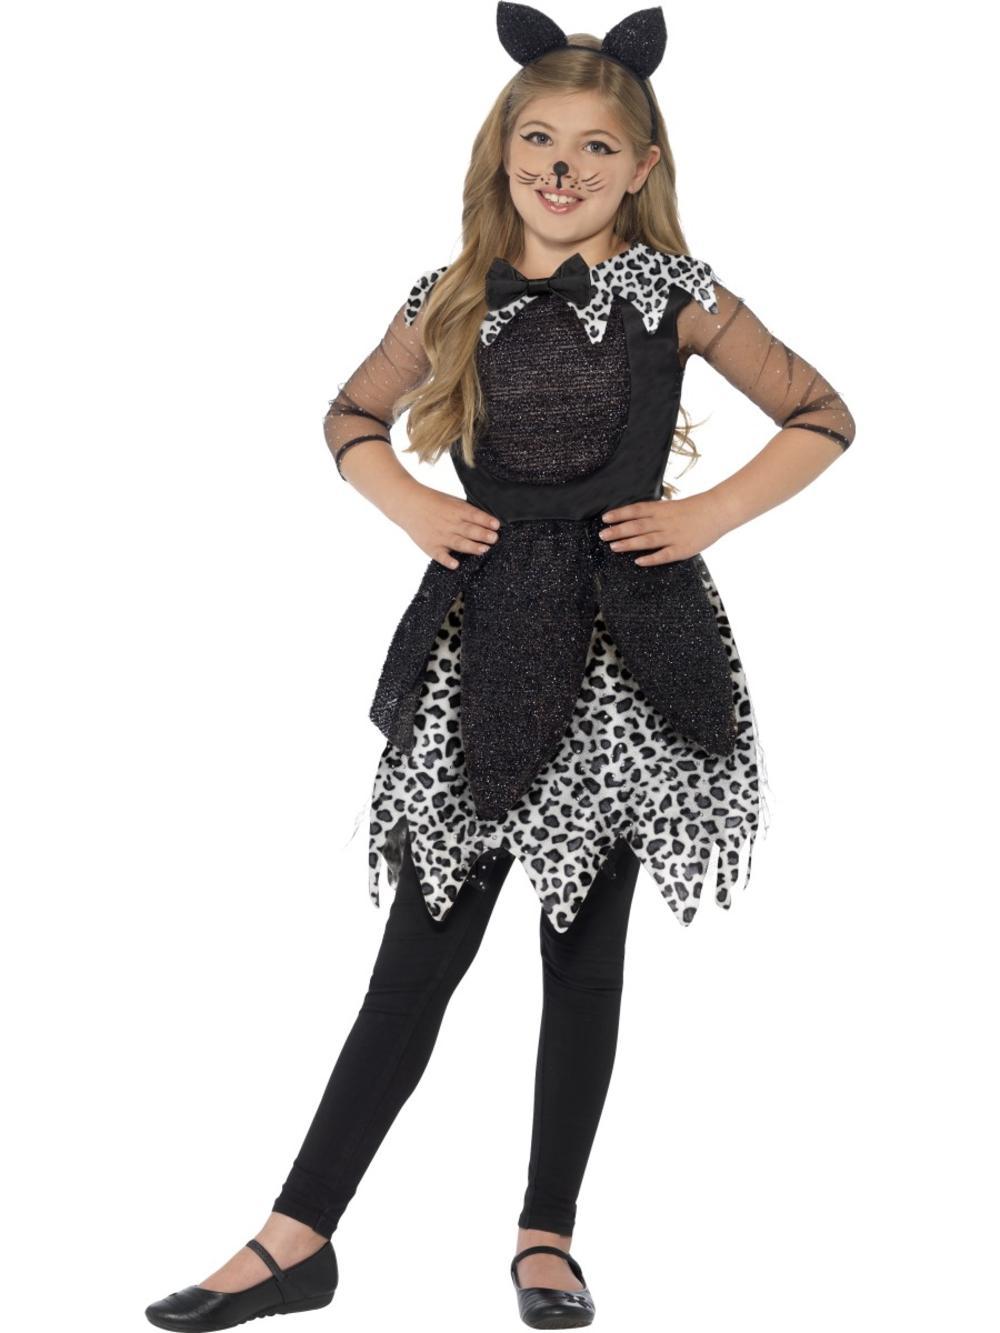 Deluxe Midnight Cat Girls Fancy Dress Halloween Animal Book Day Childs Costume